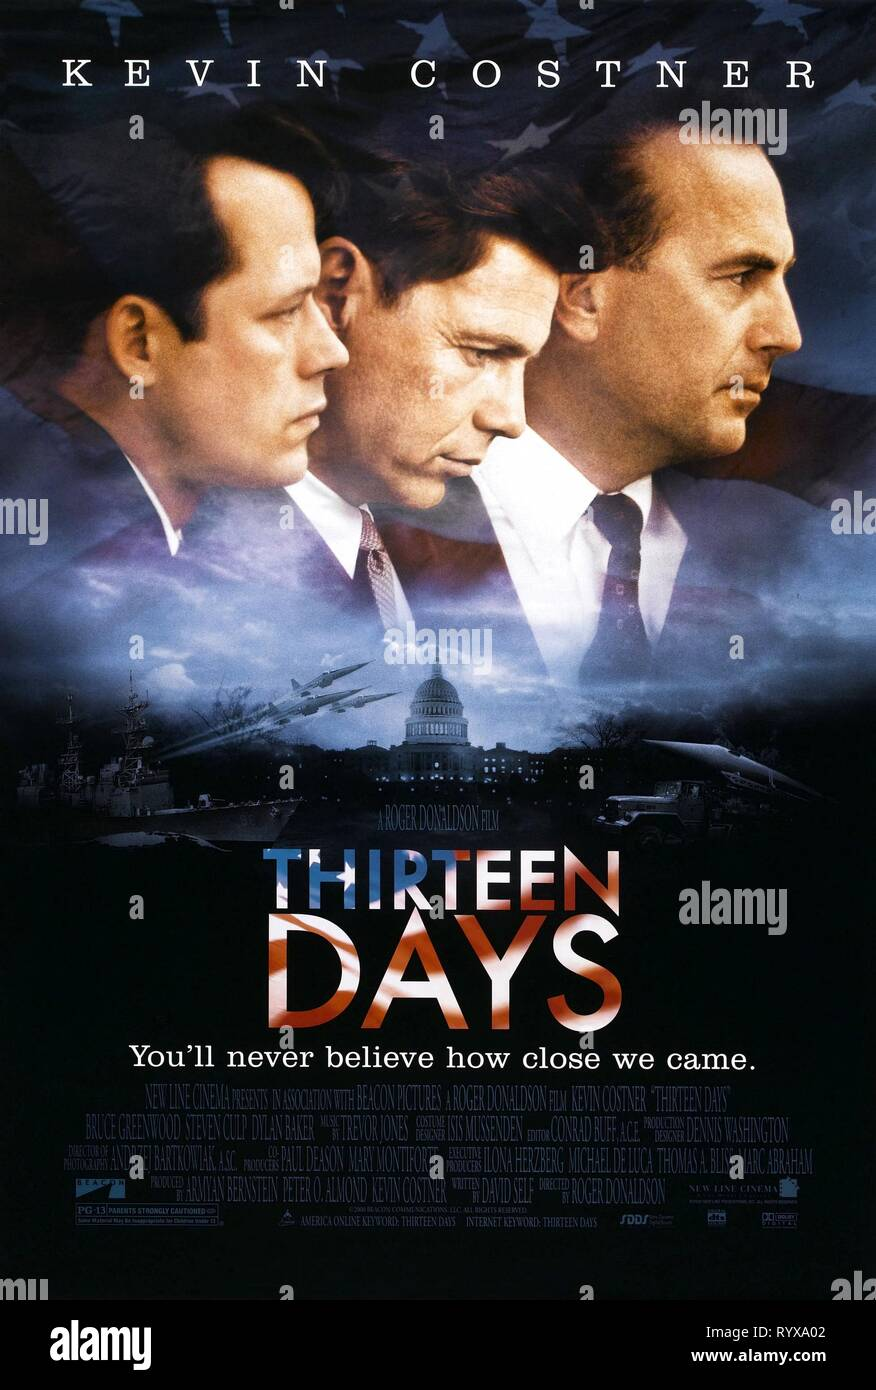 STEVEN CULP, Bruce Greenwood, Kevin Costner póster, trece días, 2000 Imagen De Stock